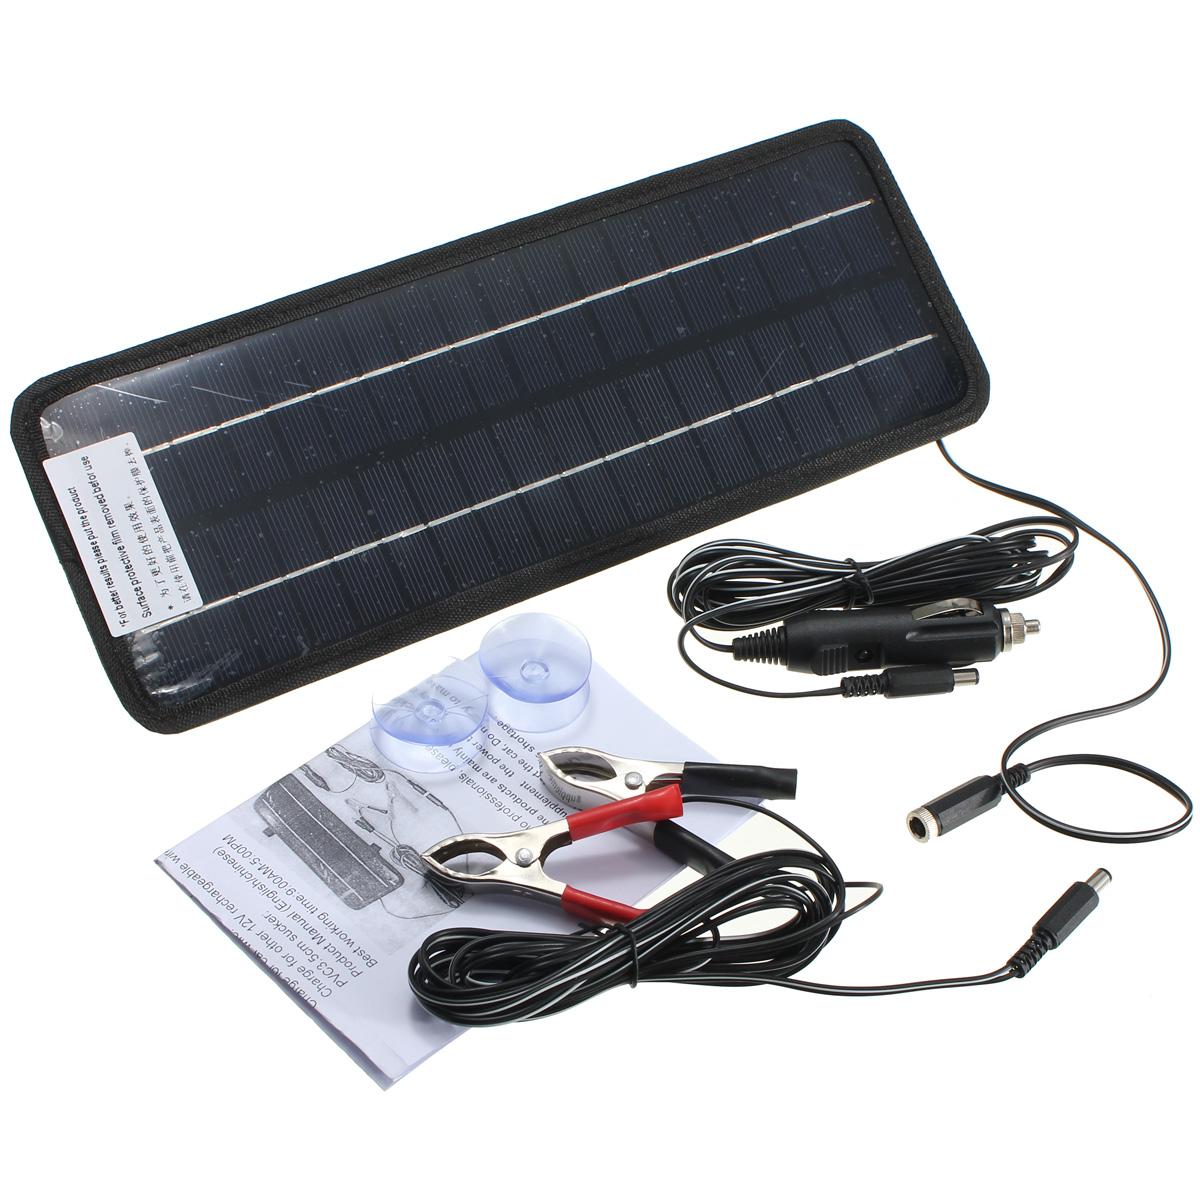 12v 4 5w solarpanel solarmodul photovoltaik solarzelle batterie ladeger t auto ebay. Black Bedroom Furniture Sets. Home Design Ideas